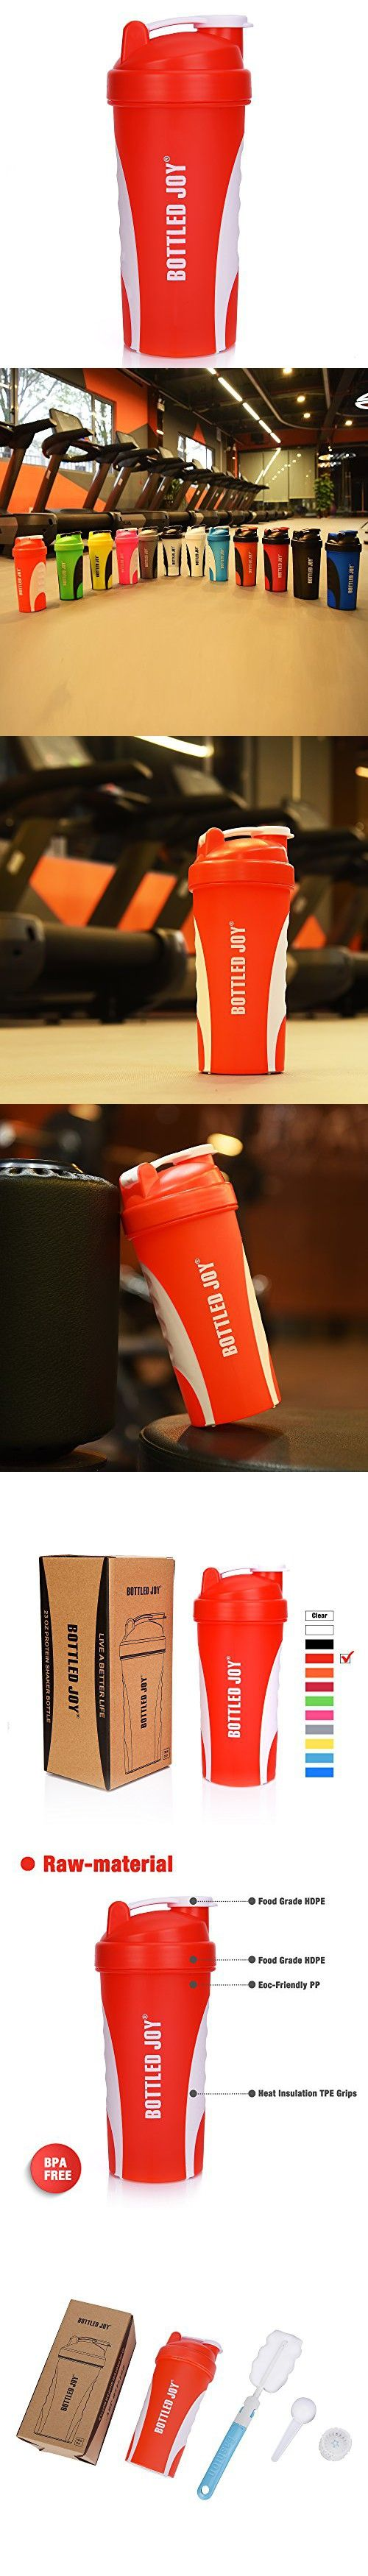 BOTTLED JOY Protein Shaker Bottle, Grip Leak Proof SportMixer Fitness Sports Nutrition Supplements Mix Bottle, Non-slip part 27oz 800ml (Red)